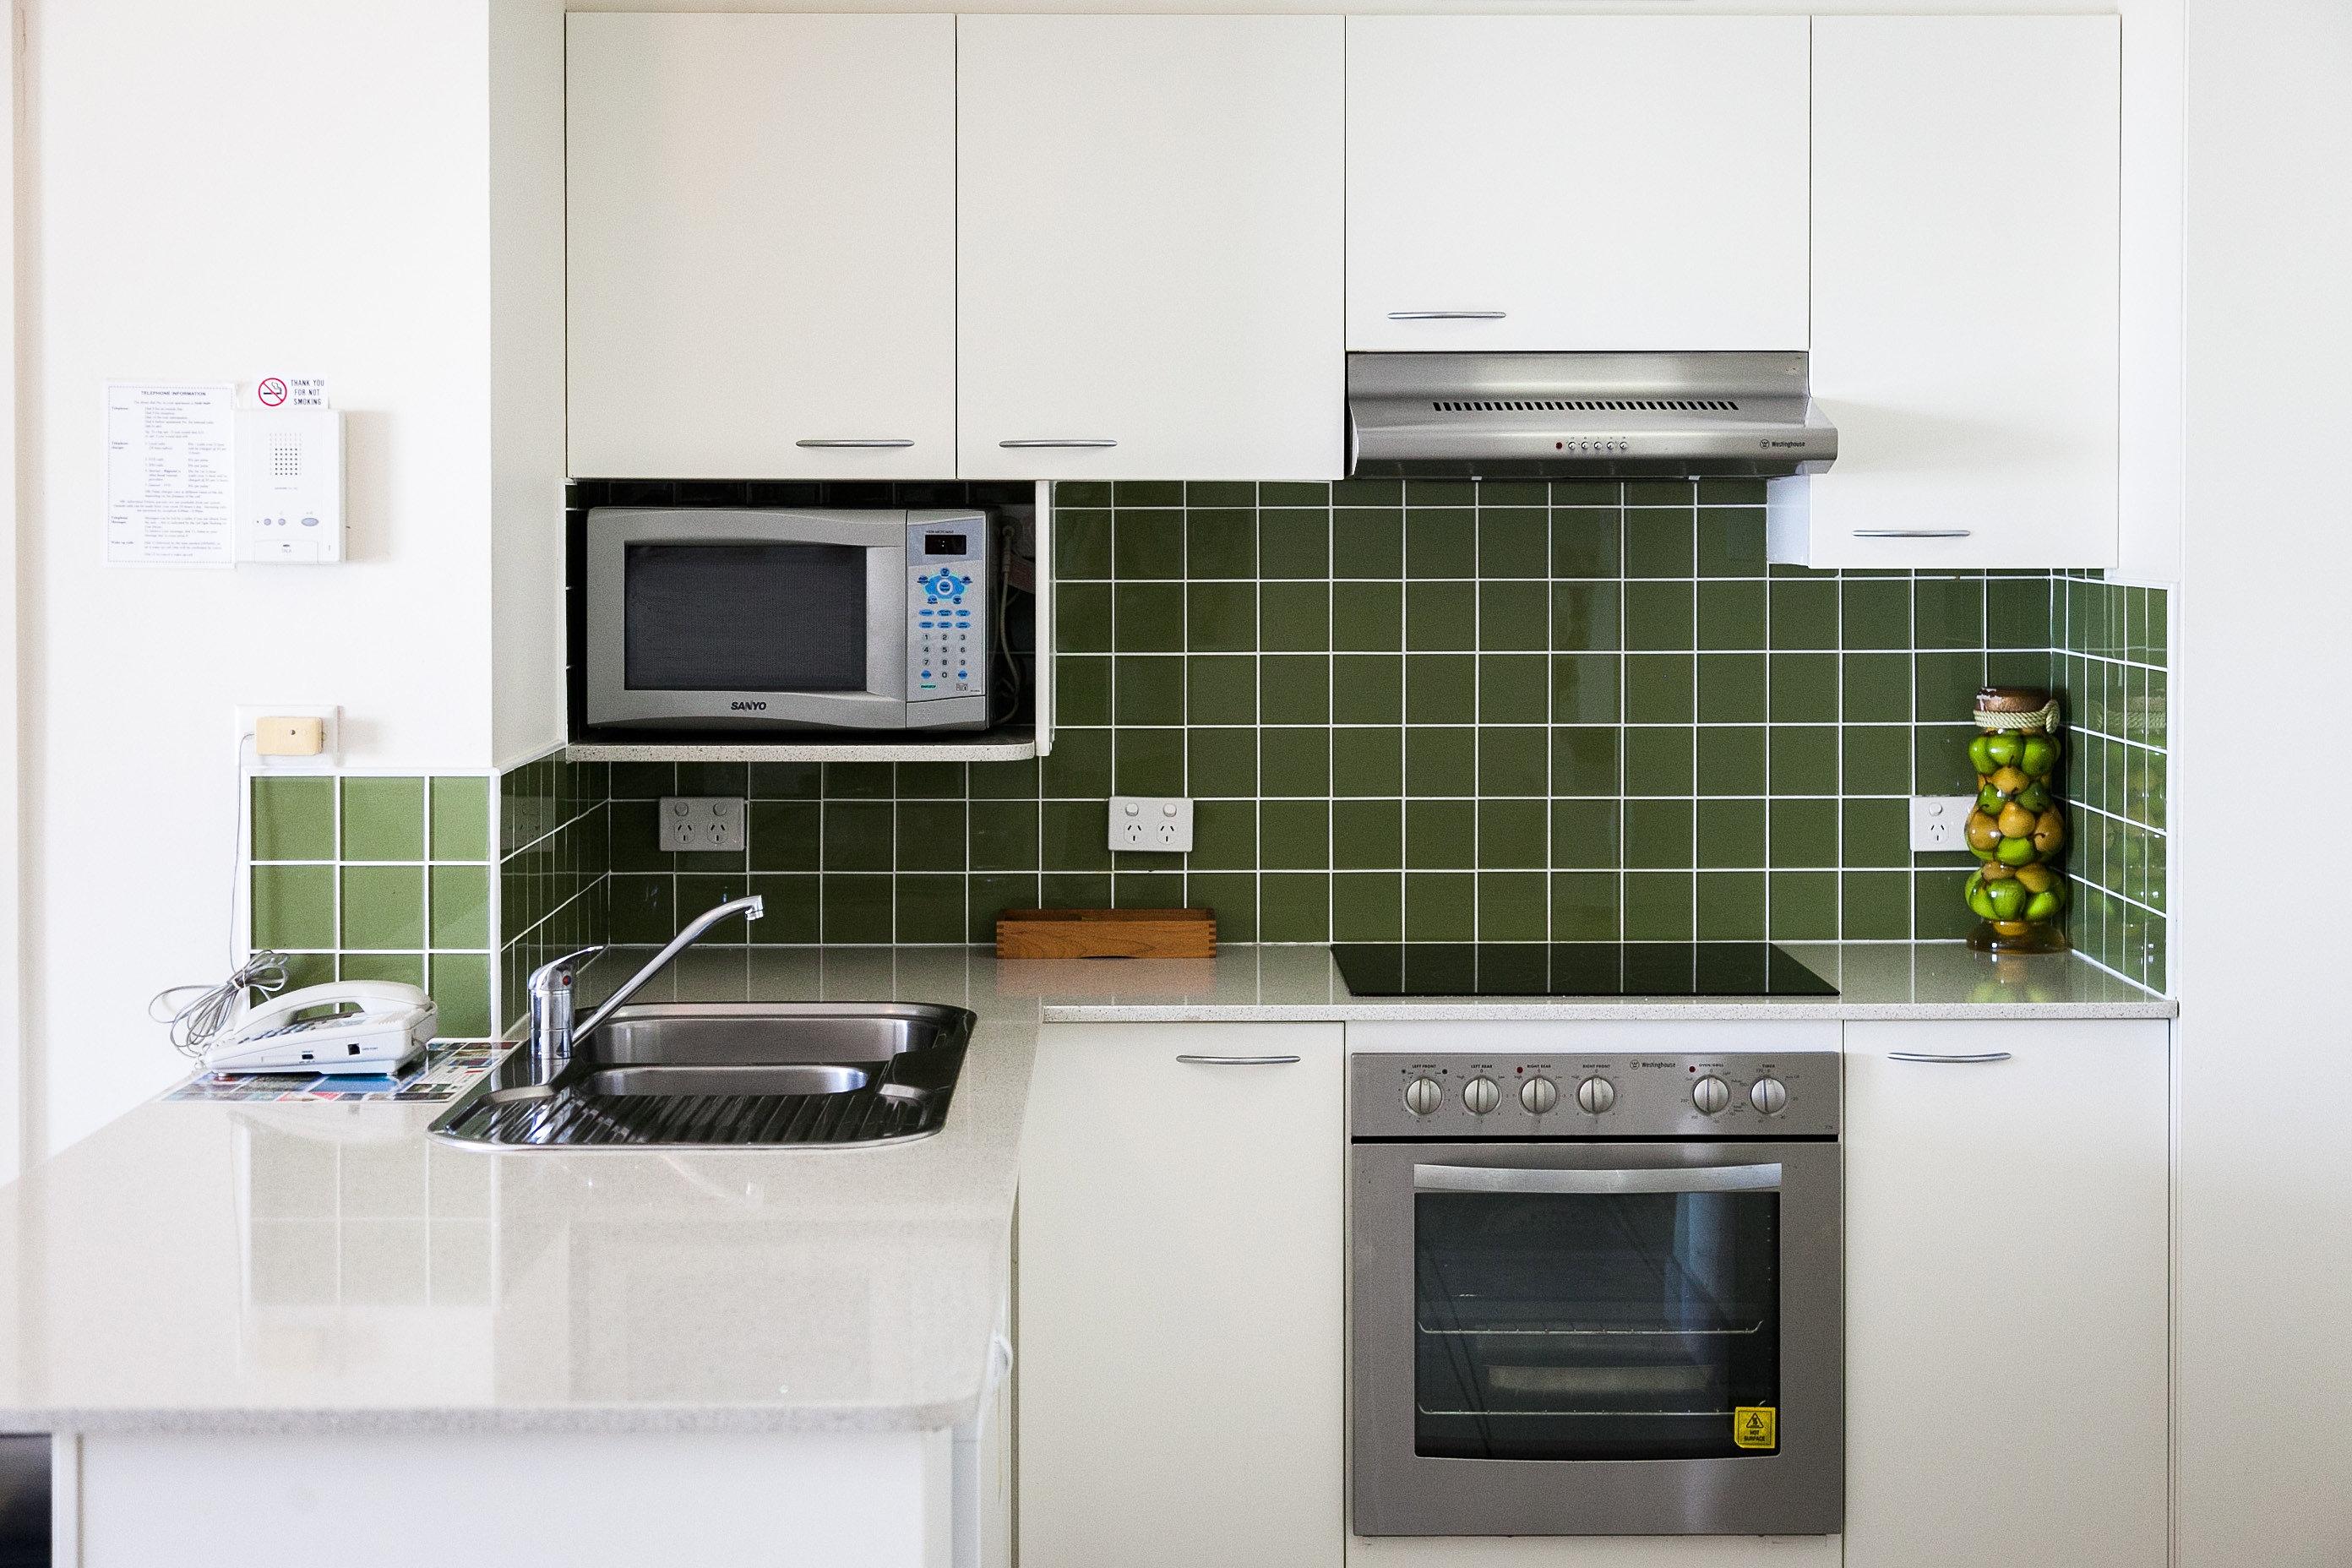 Uncategorized Kitchen Appliances Sunshine Coast coolum beach luxury apartments sunshine coast qld caprice fully self contained kitchen